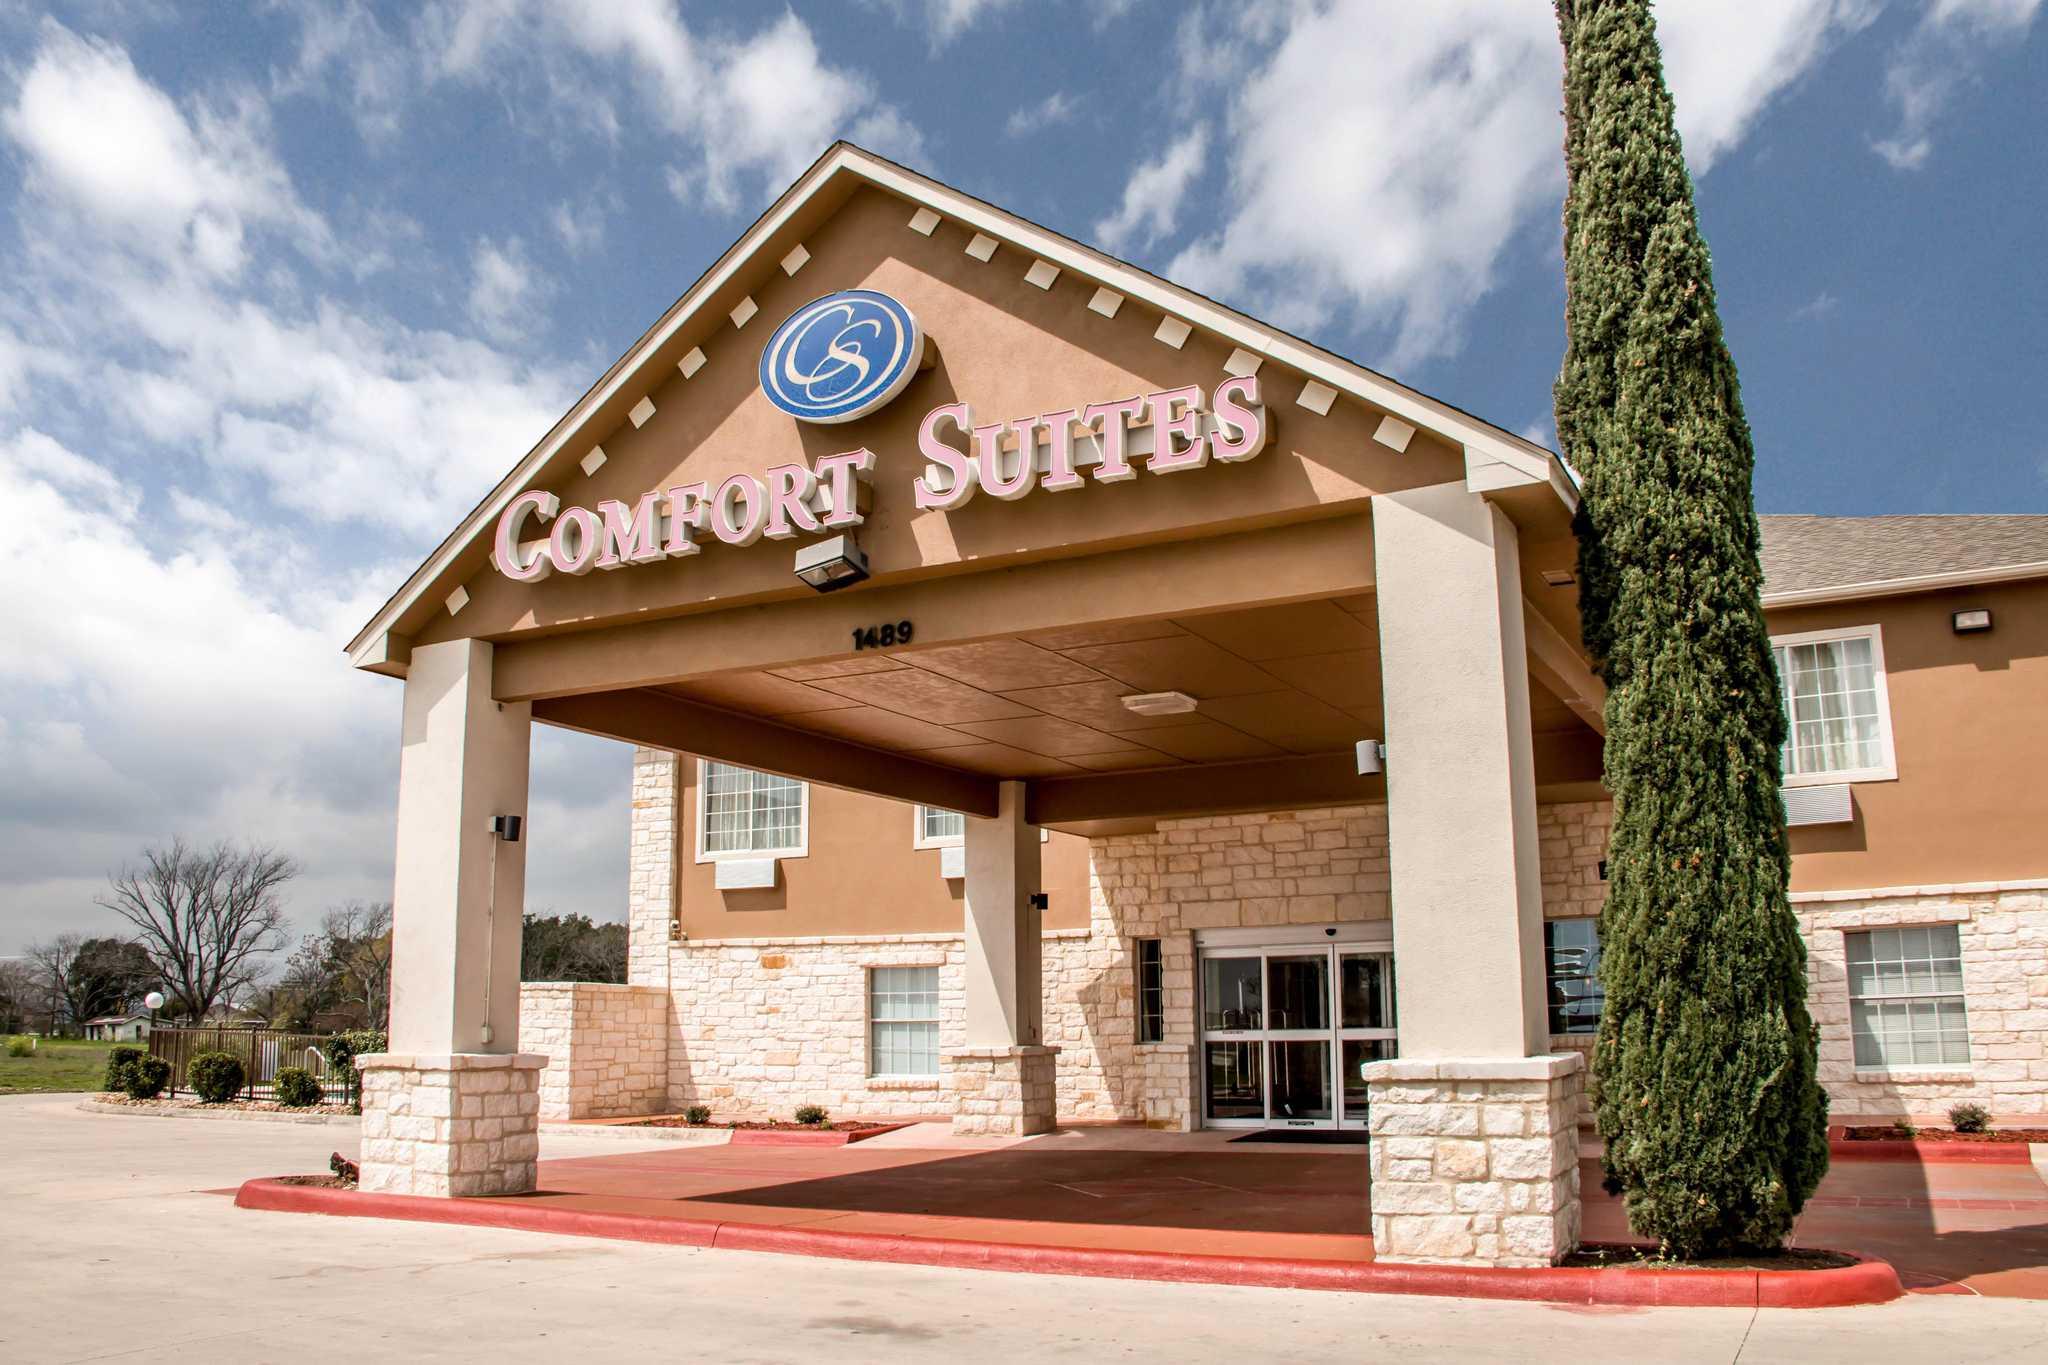 Comfort Suites New Braunfels Texas Tx